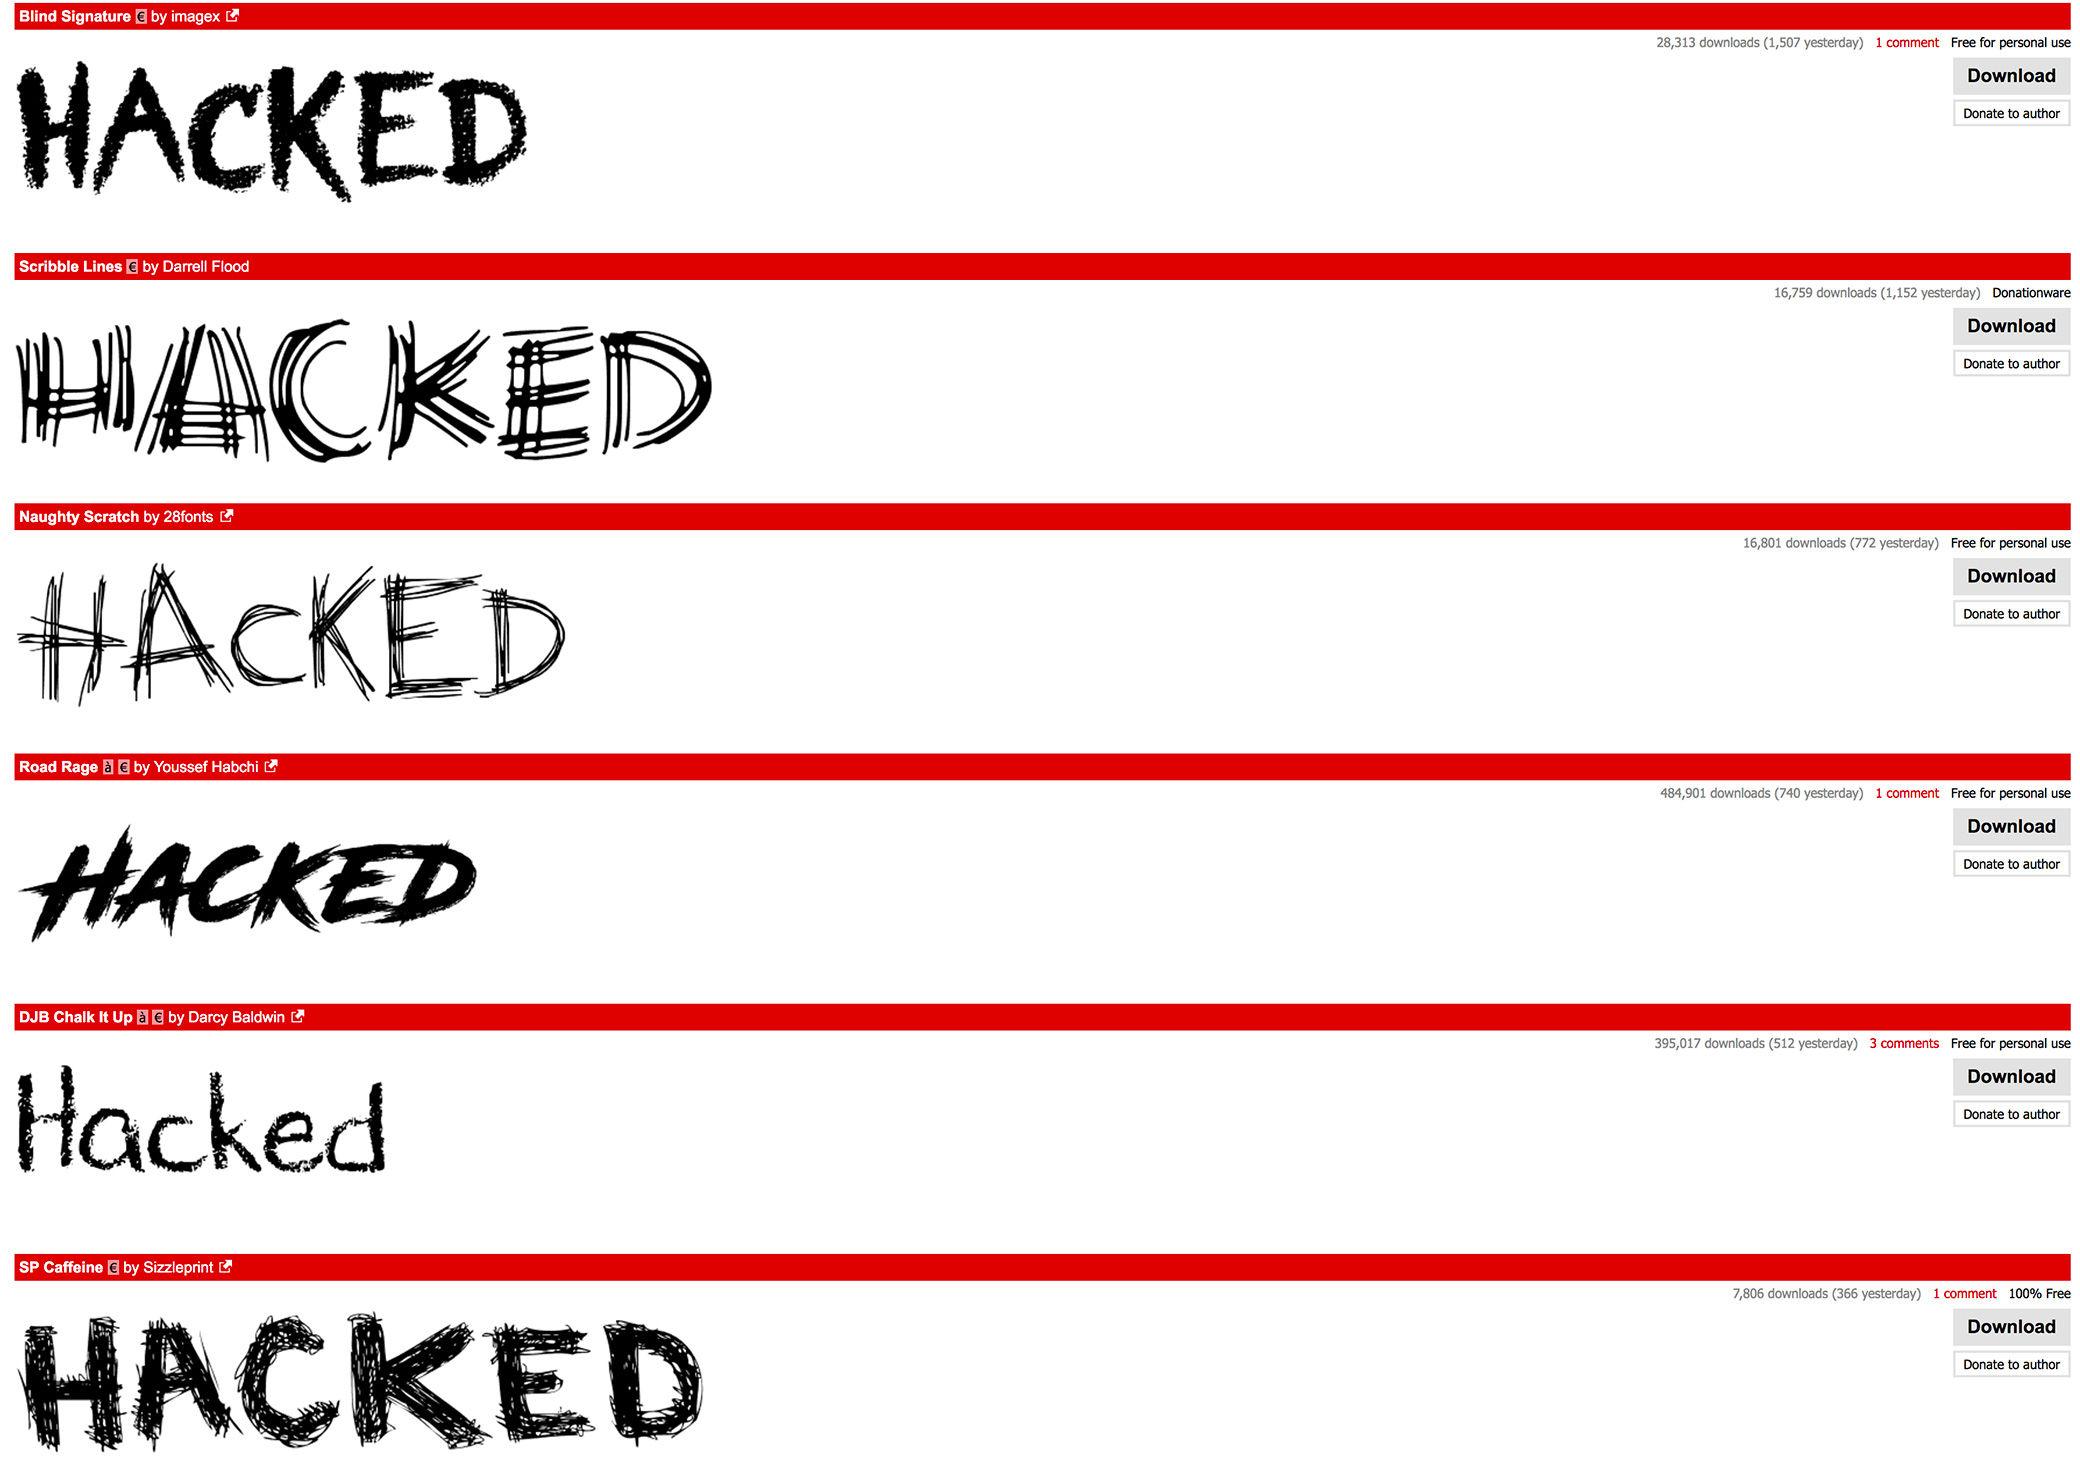 dafont-hacked-opener.